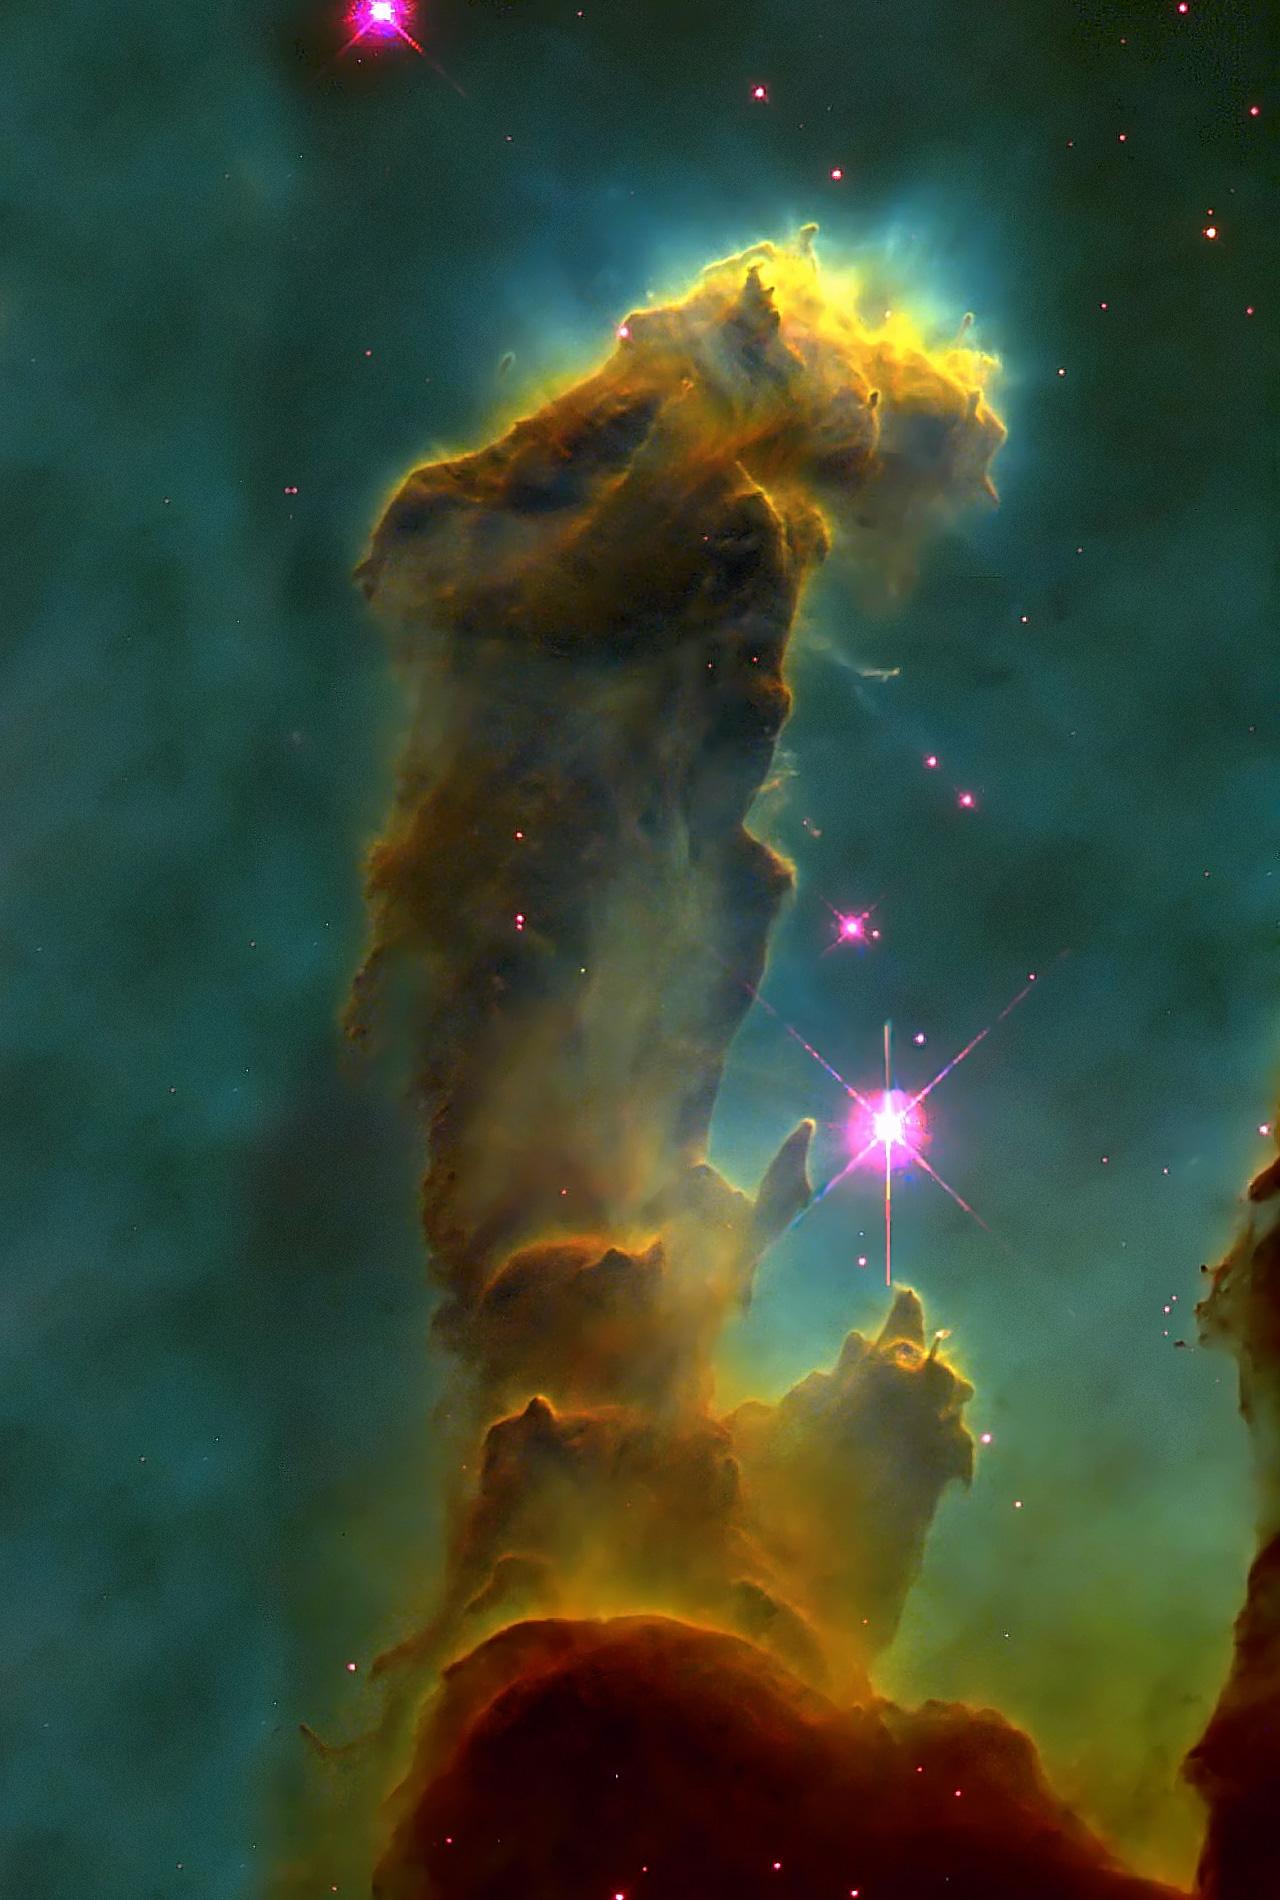 Eagle nebula wallpaper wallpapersafari - Pillars of creation wallpaper ...